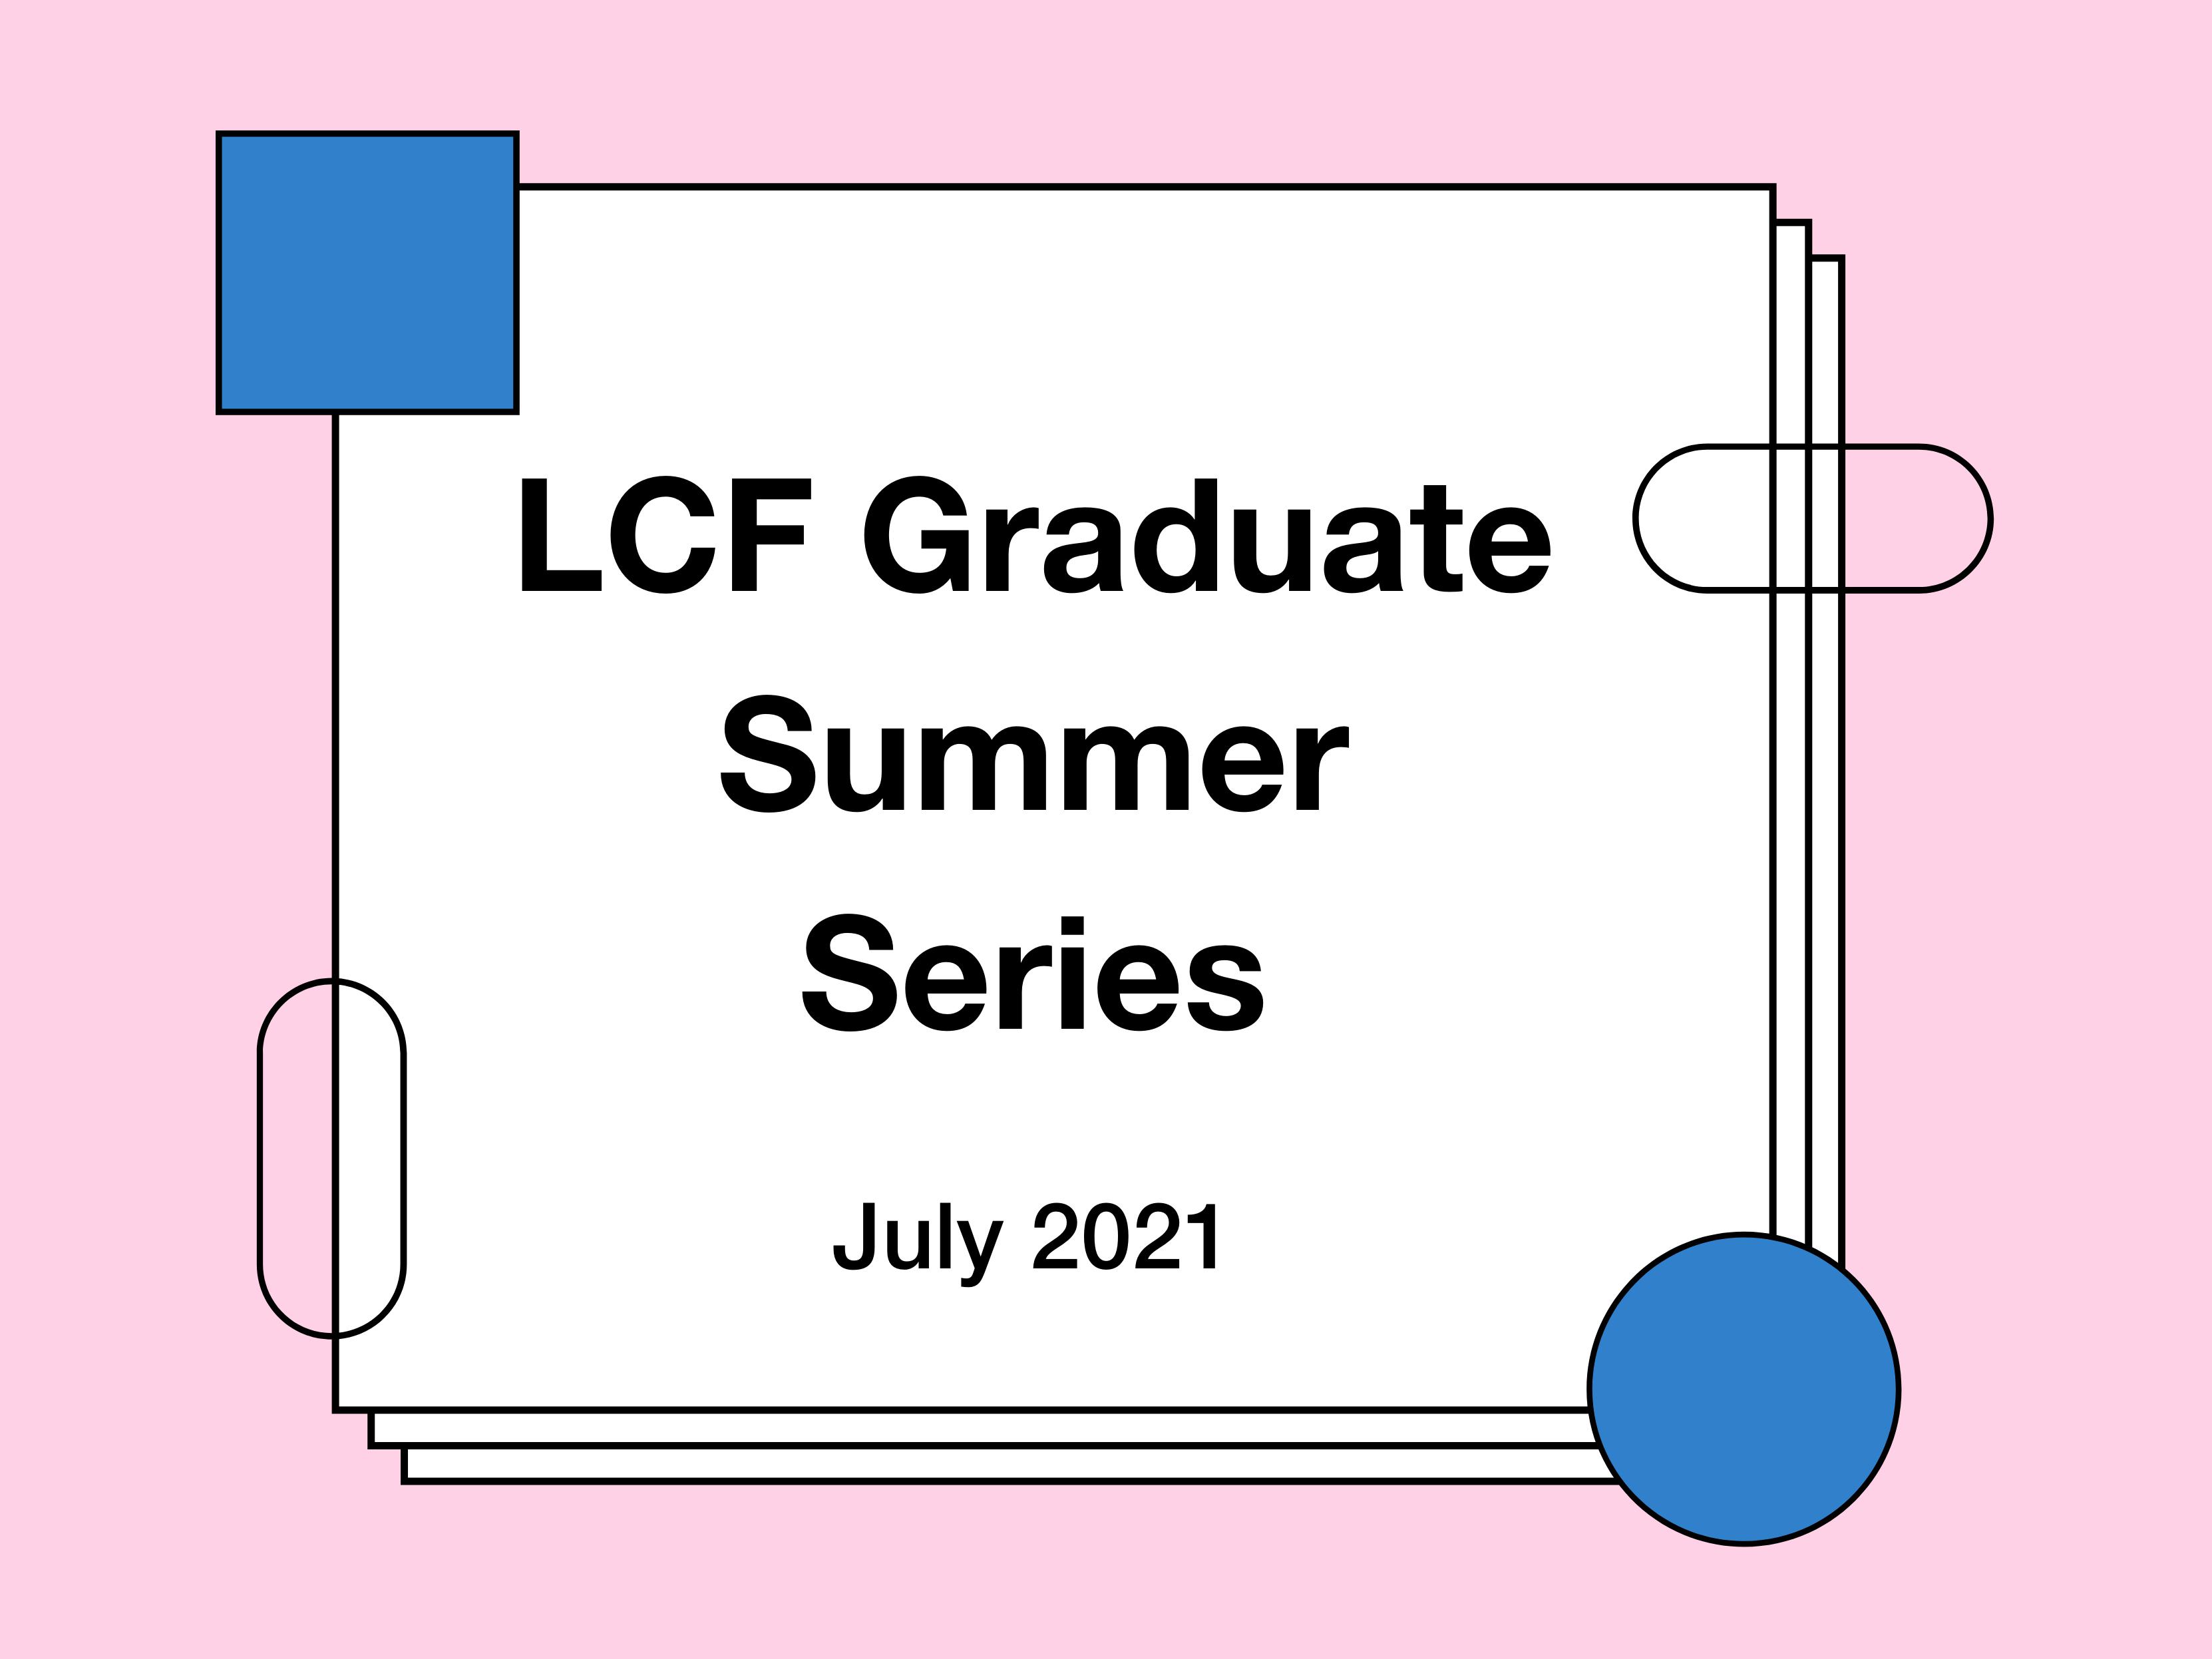 LCF Graduate Summer Series 2021